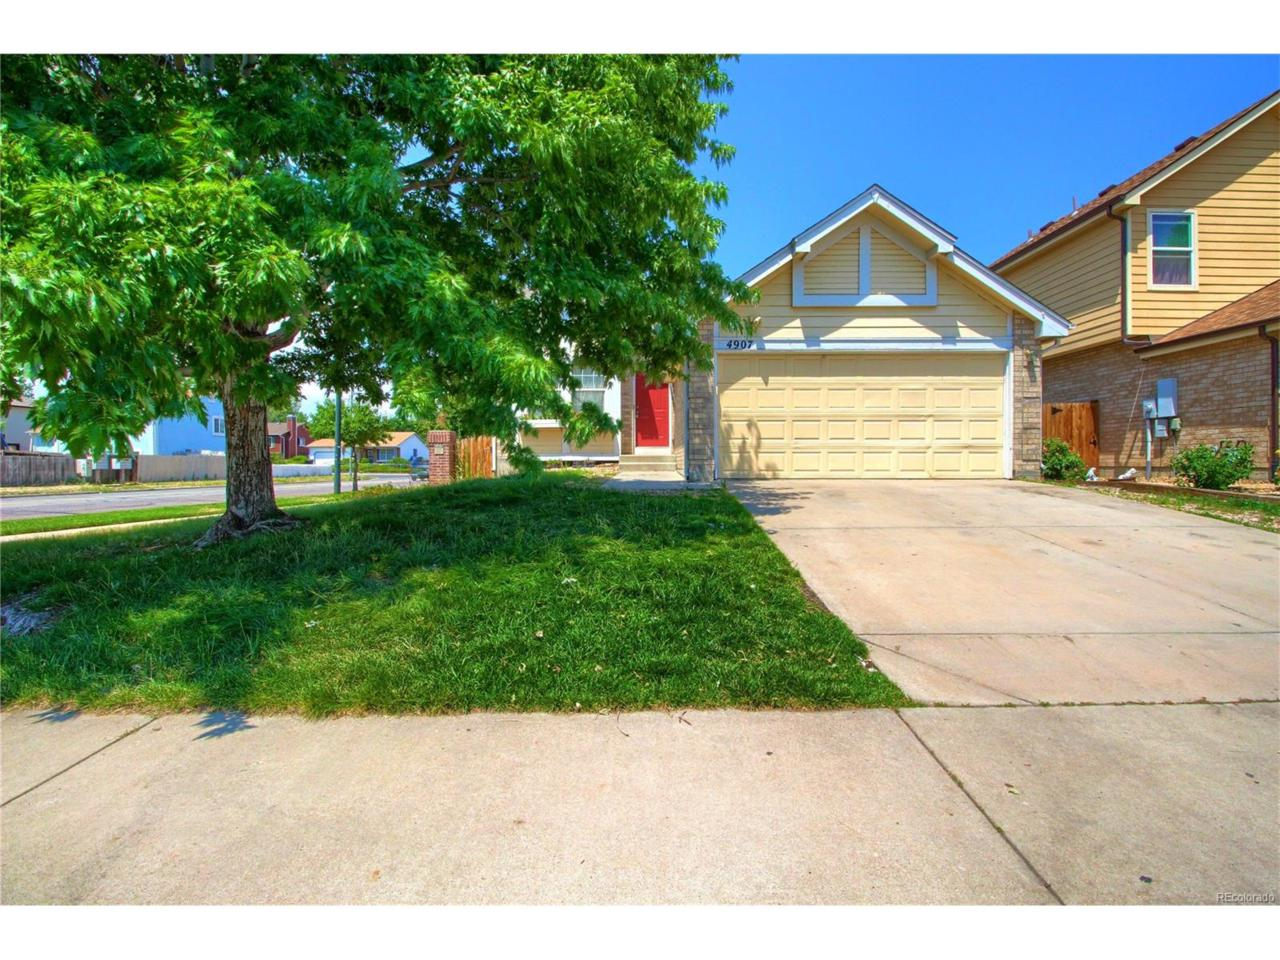 4907 Eugene Court, Denver, CO 80239 (MLS #8279172) :: 8z Real Estate